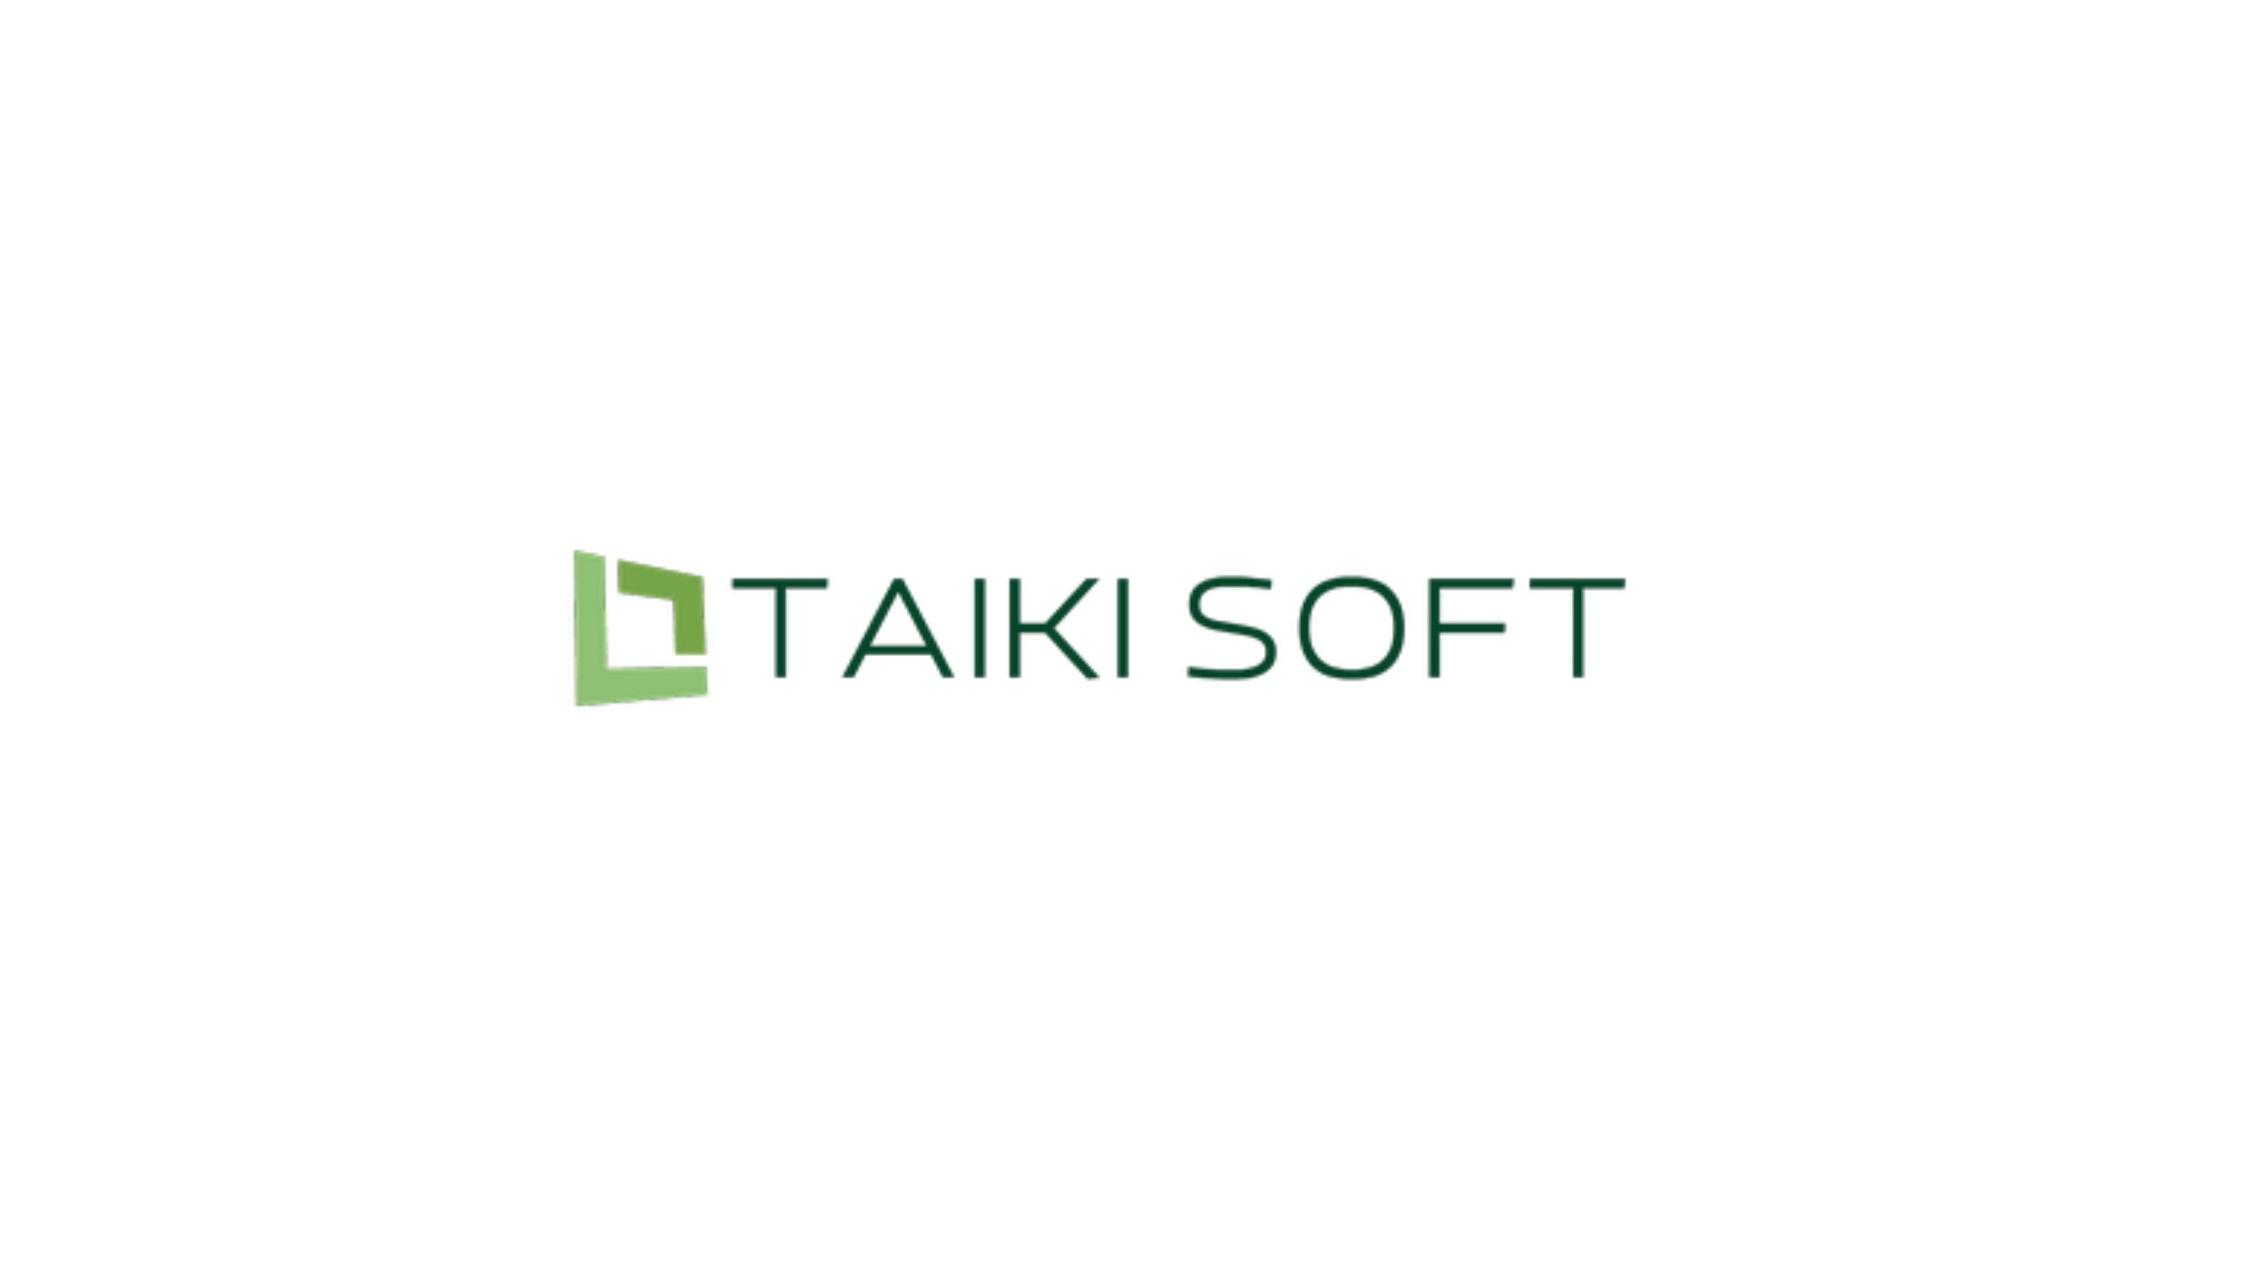 TAIKI SOFT